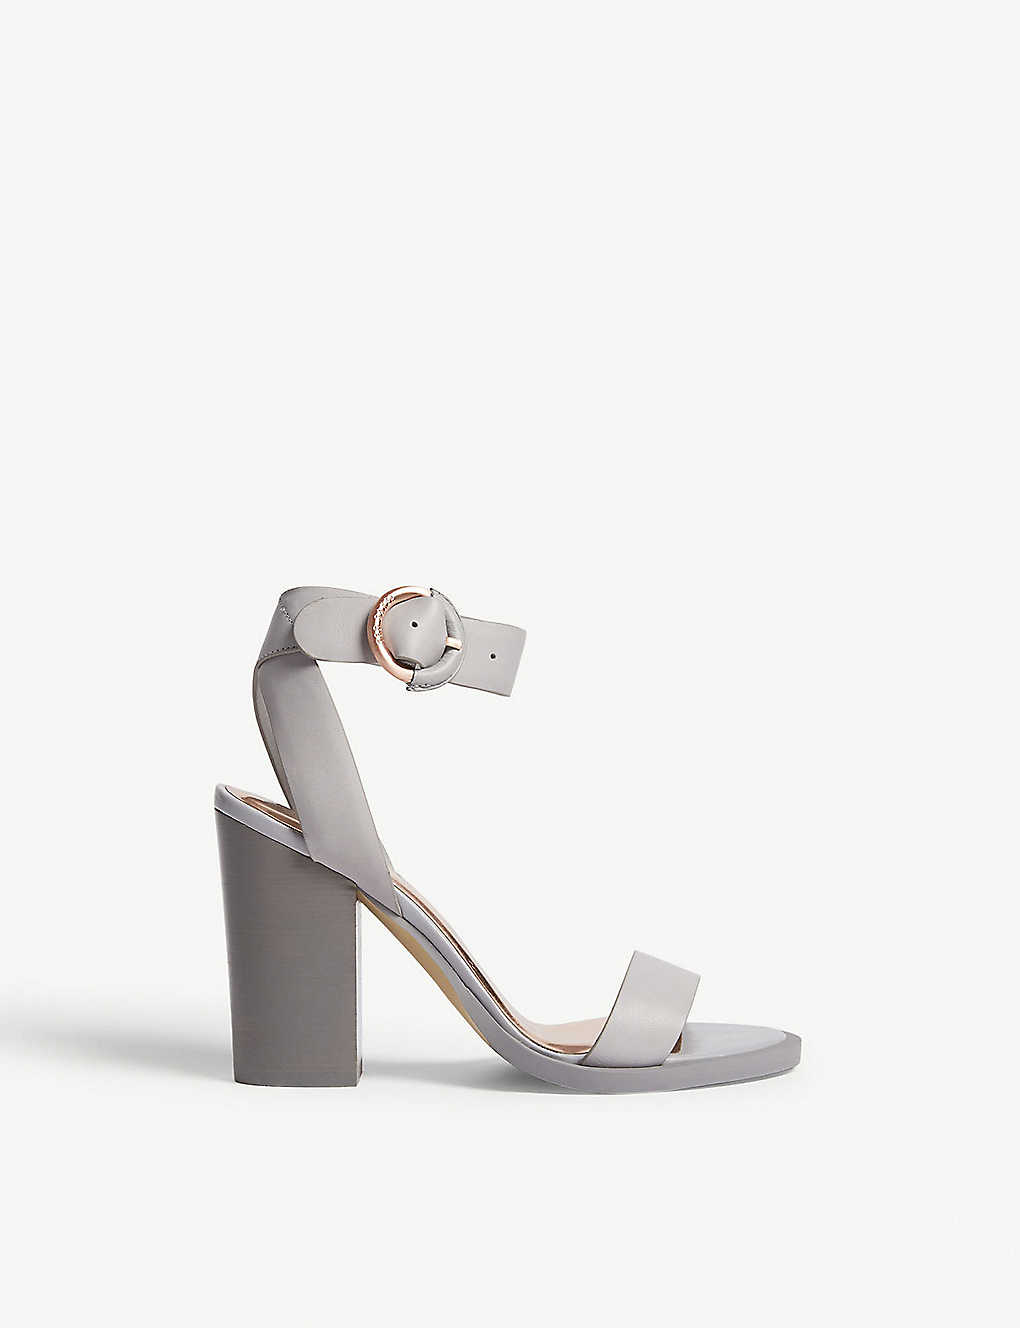 80cd1e2b979 TED BAKER - Betciy buckle sandals